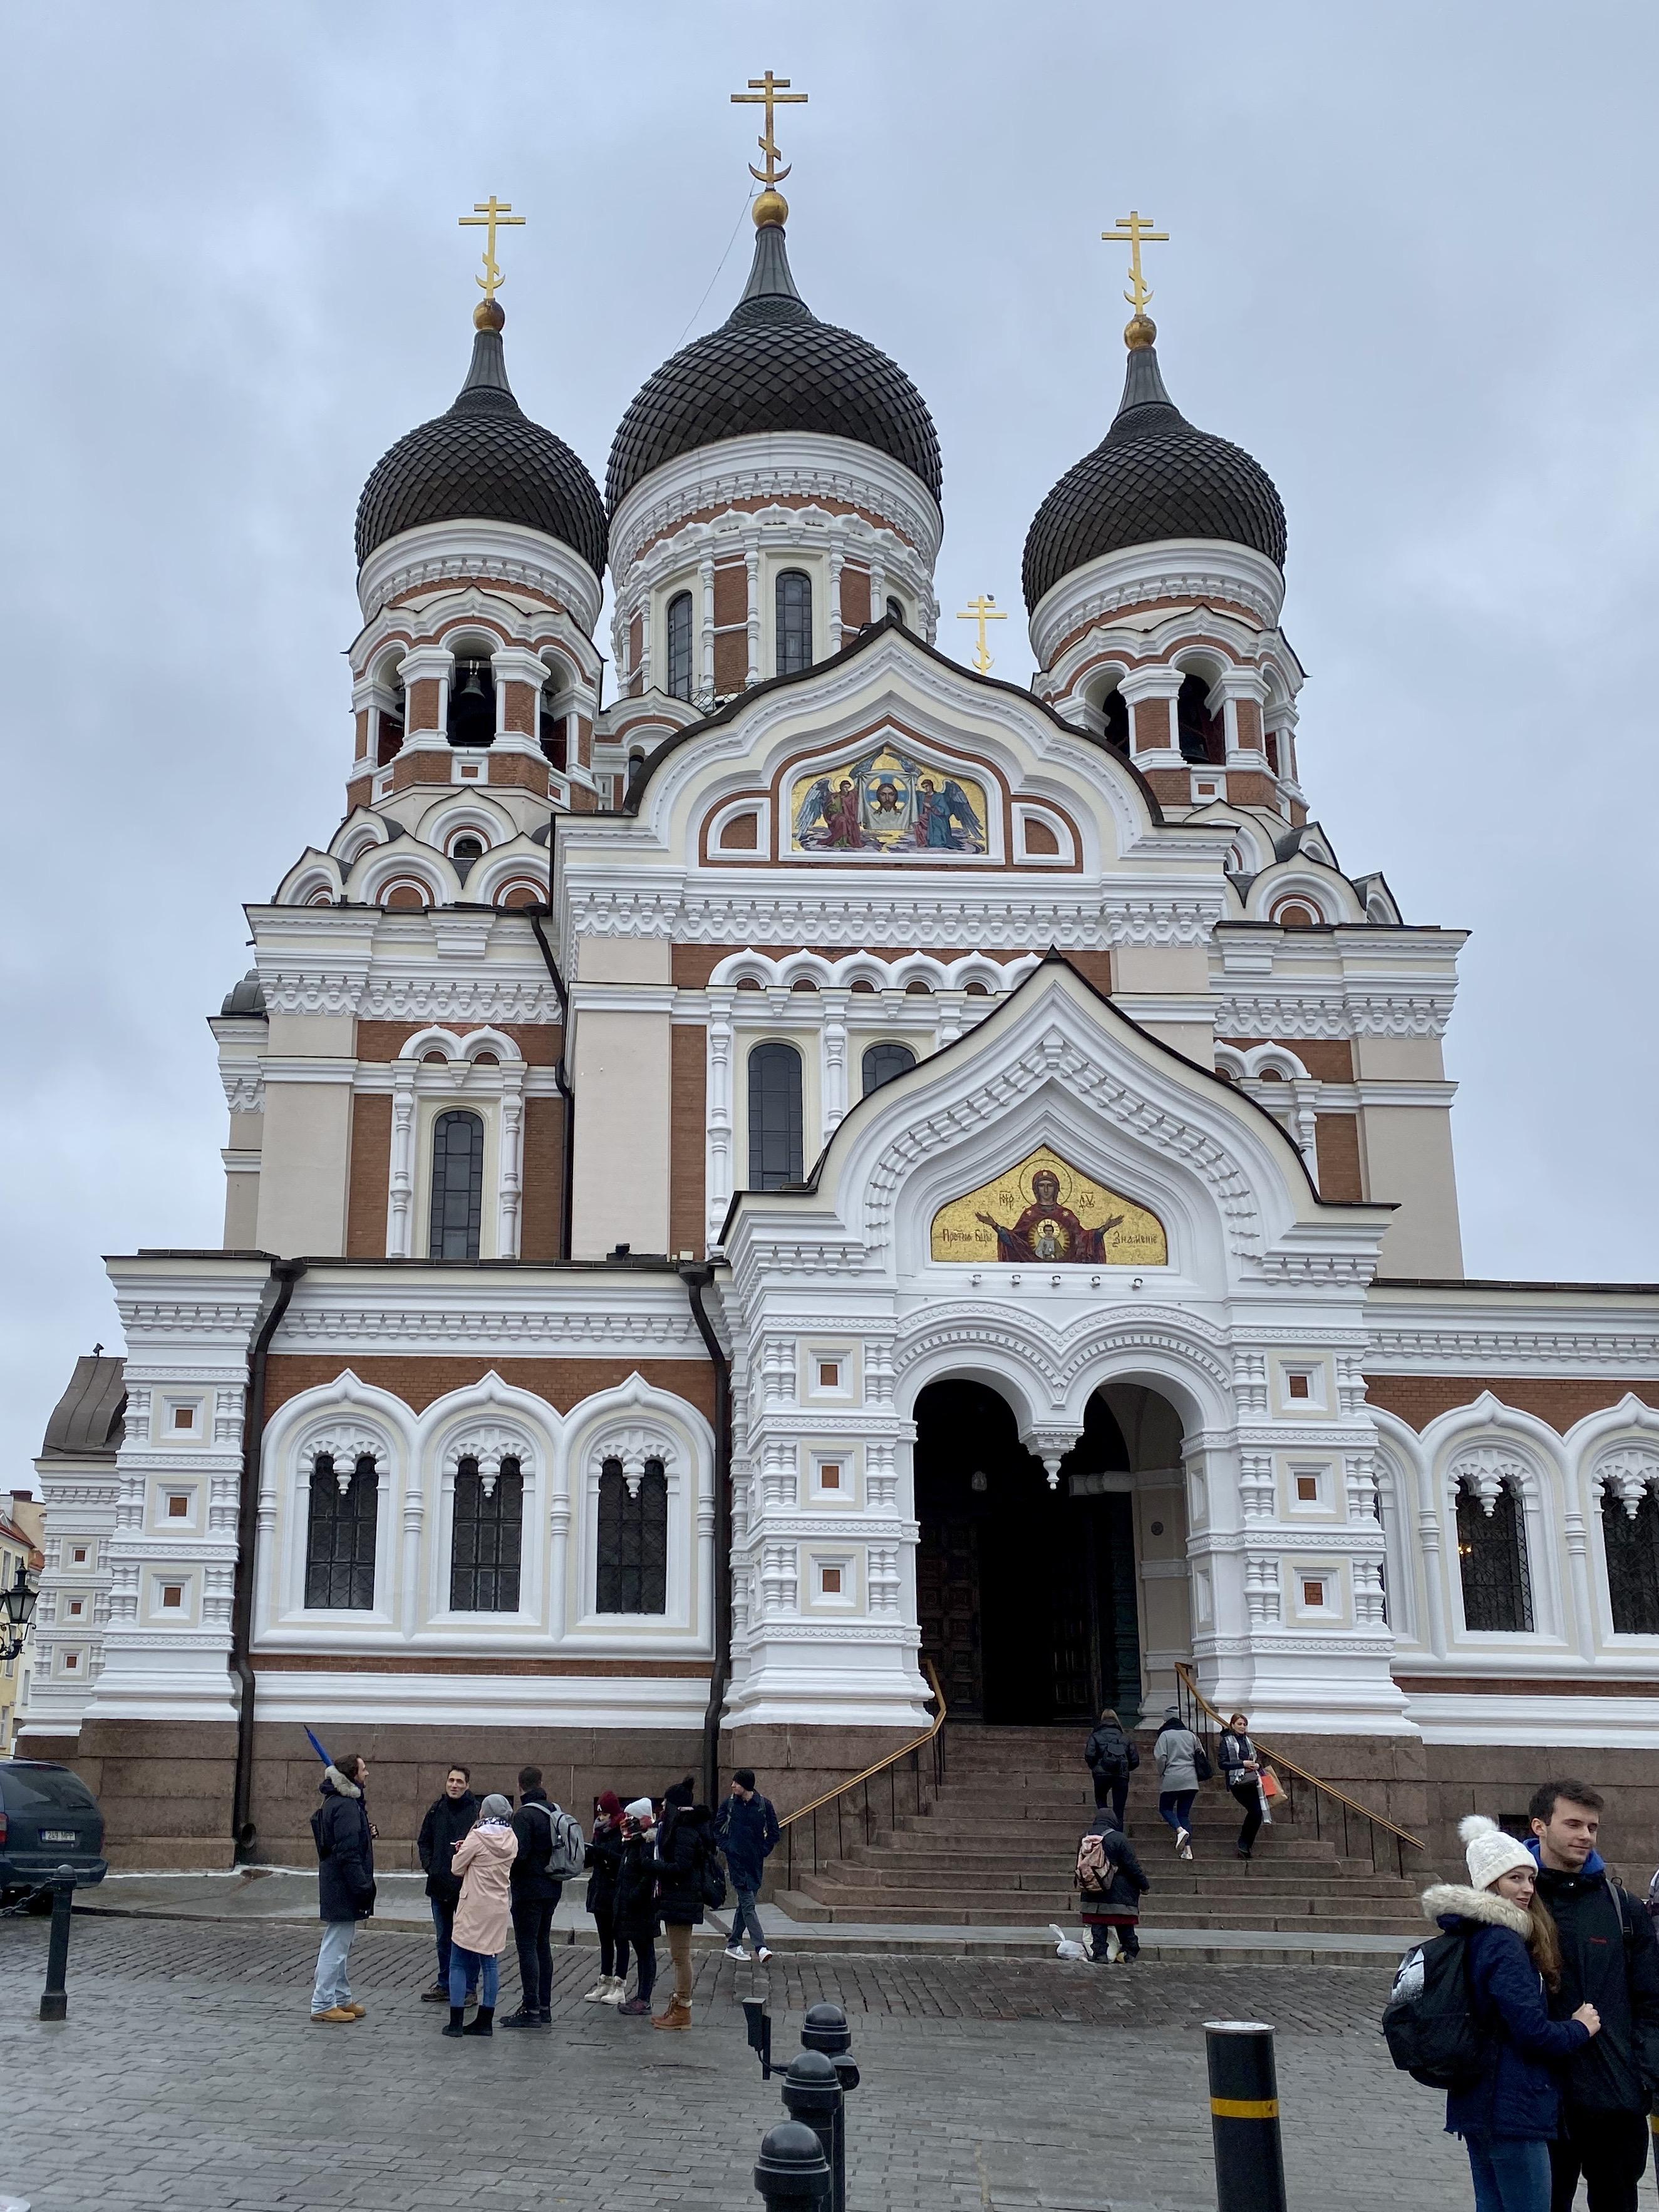 The Alexander Nevsky Cathedral in Tallinn, Estonia.